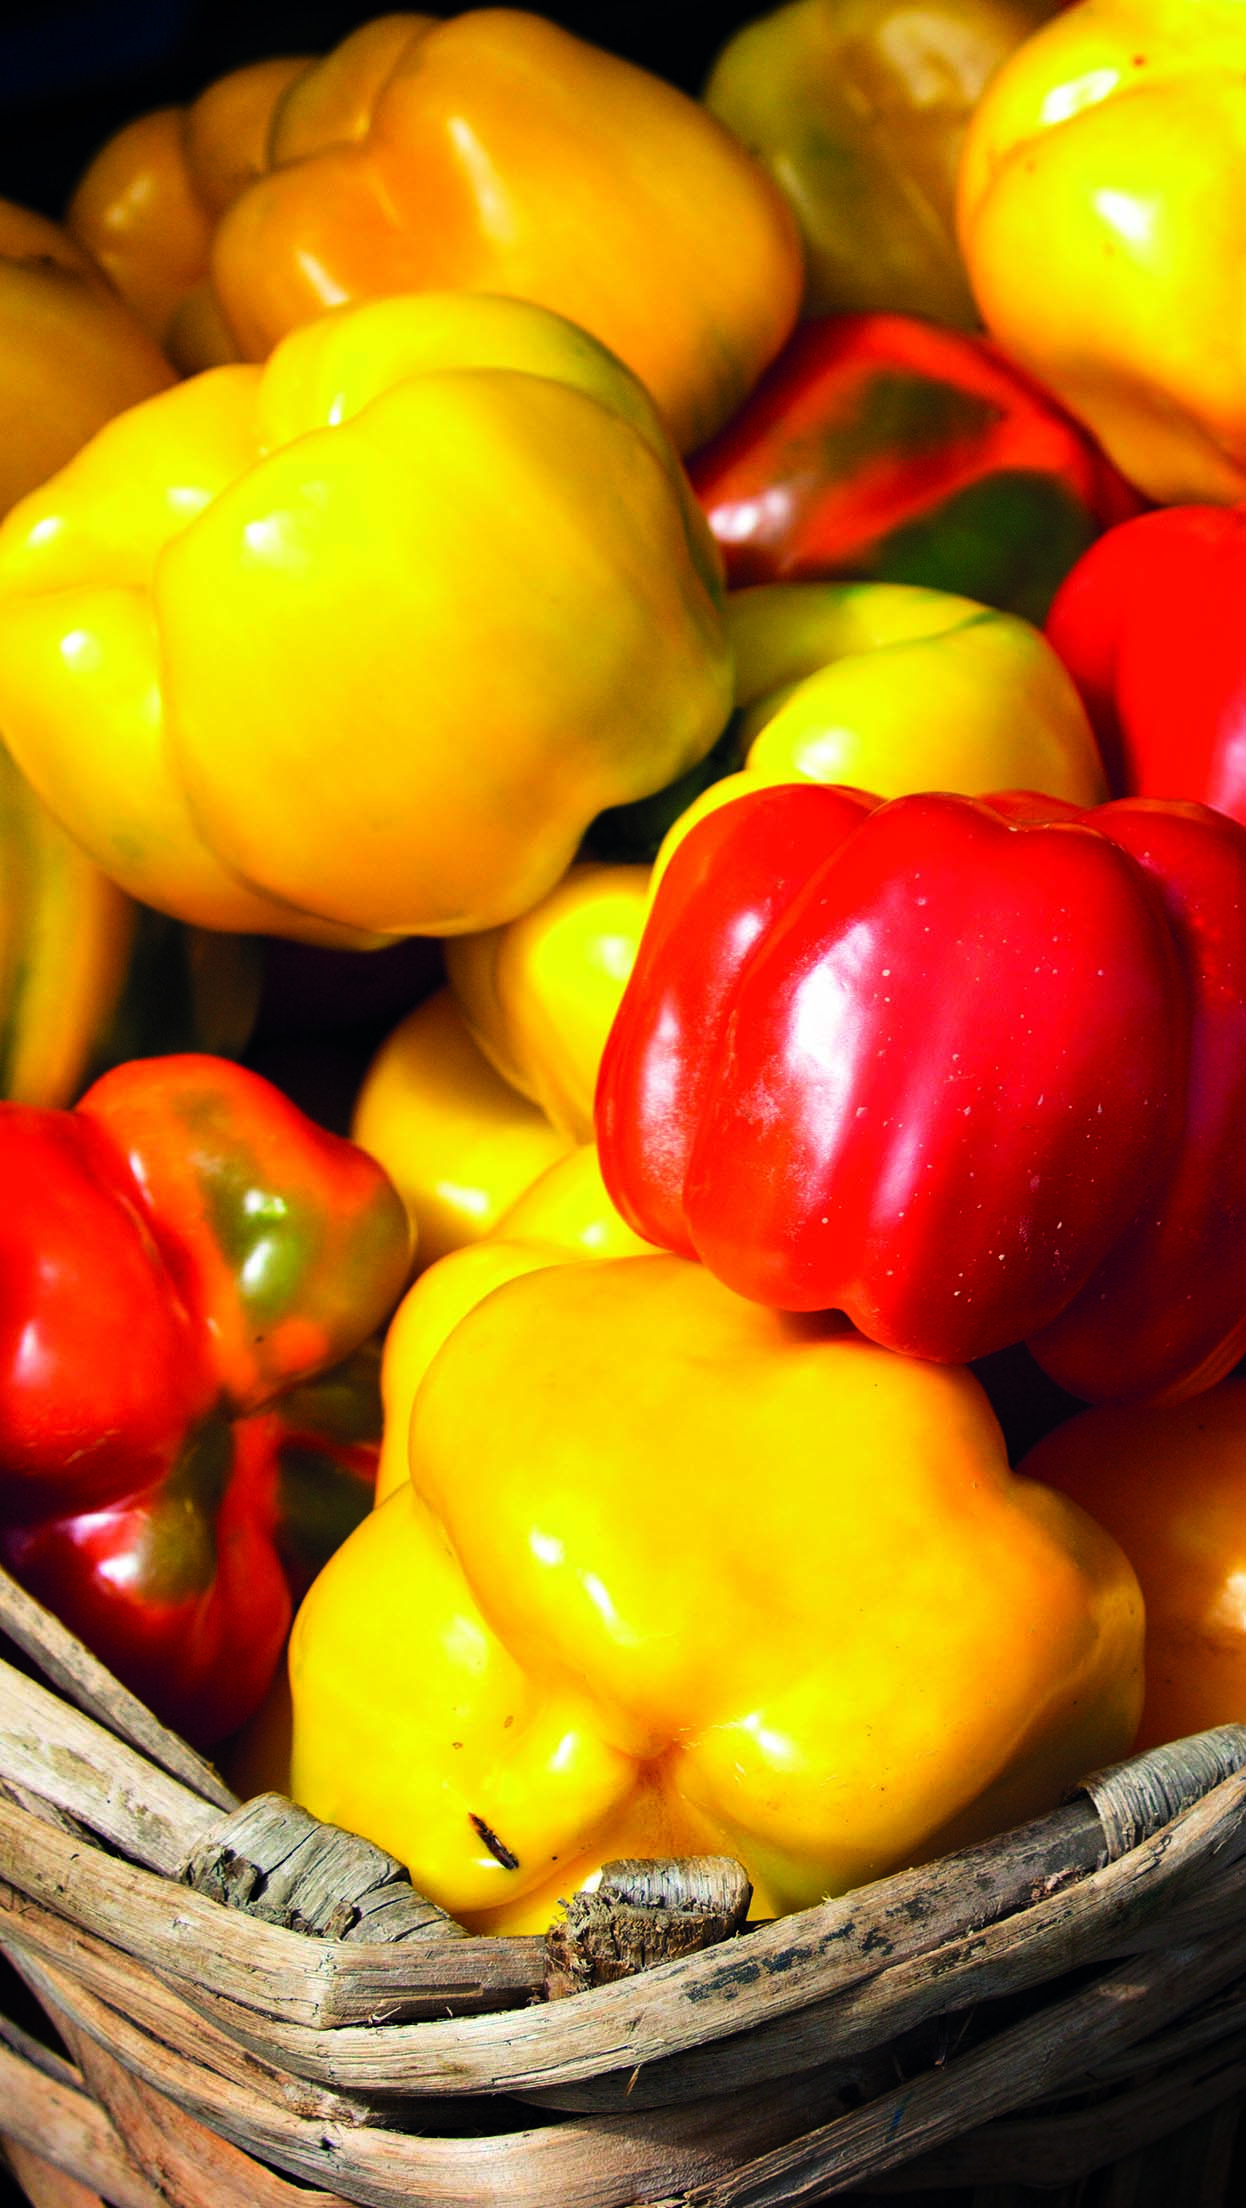 peperone di carmagnola | Flick on Food